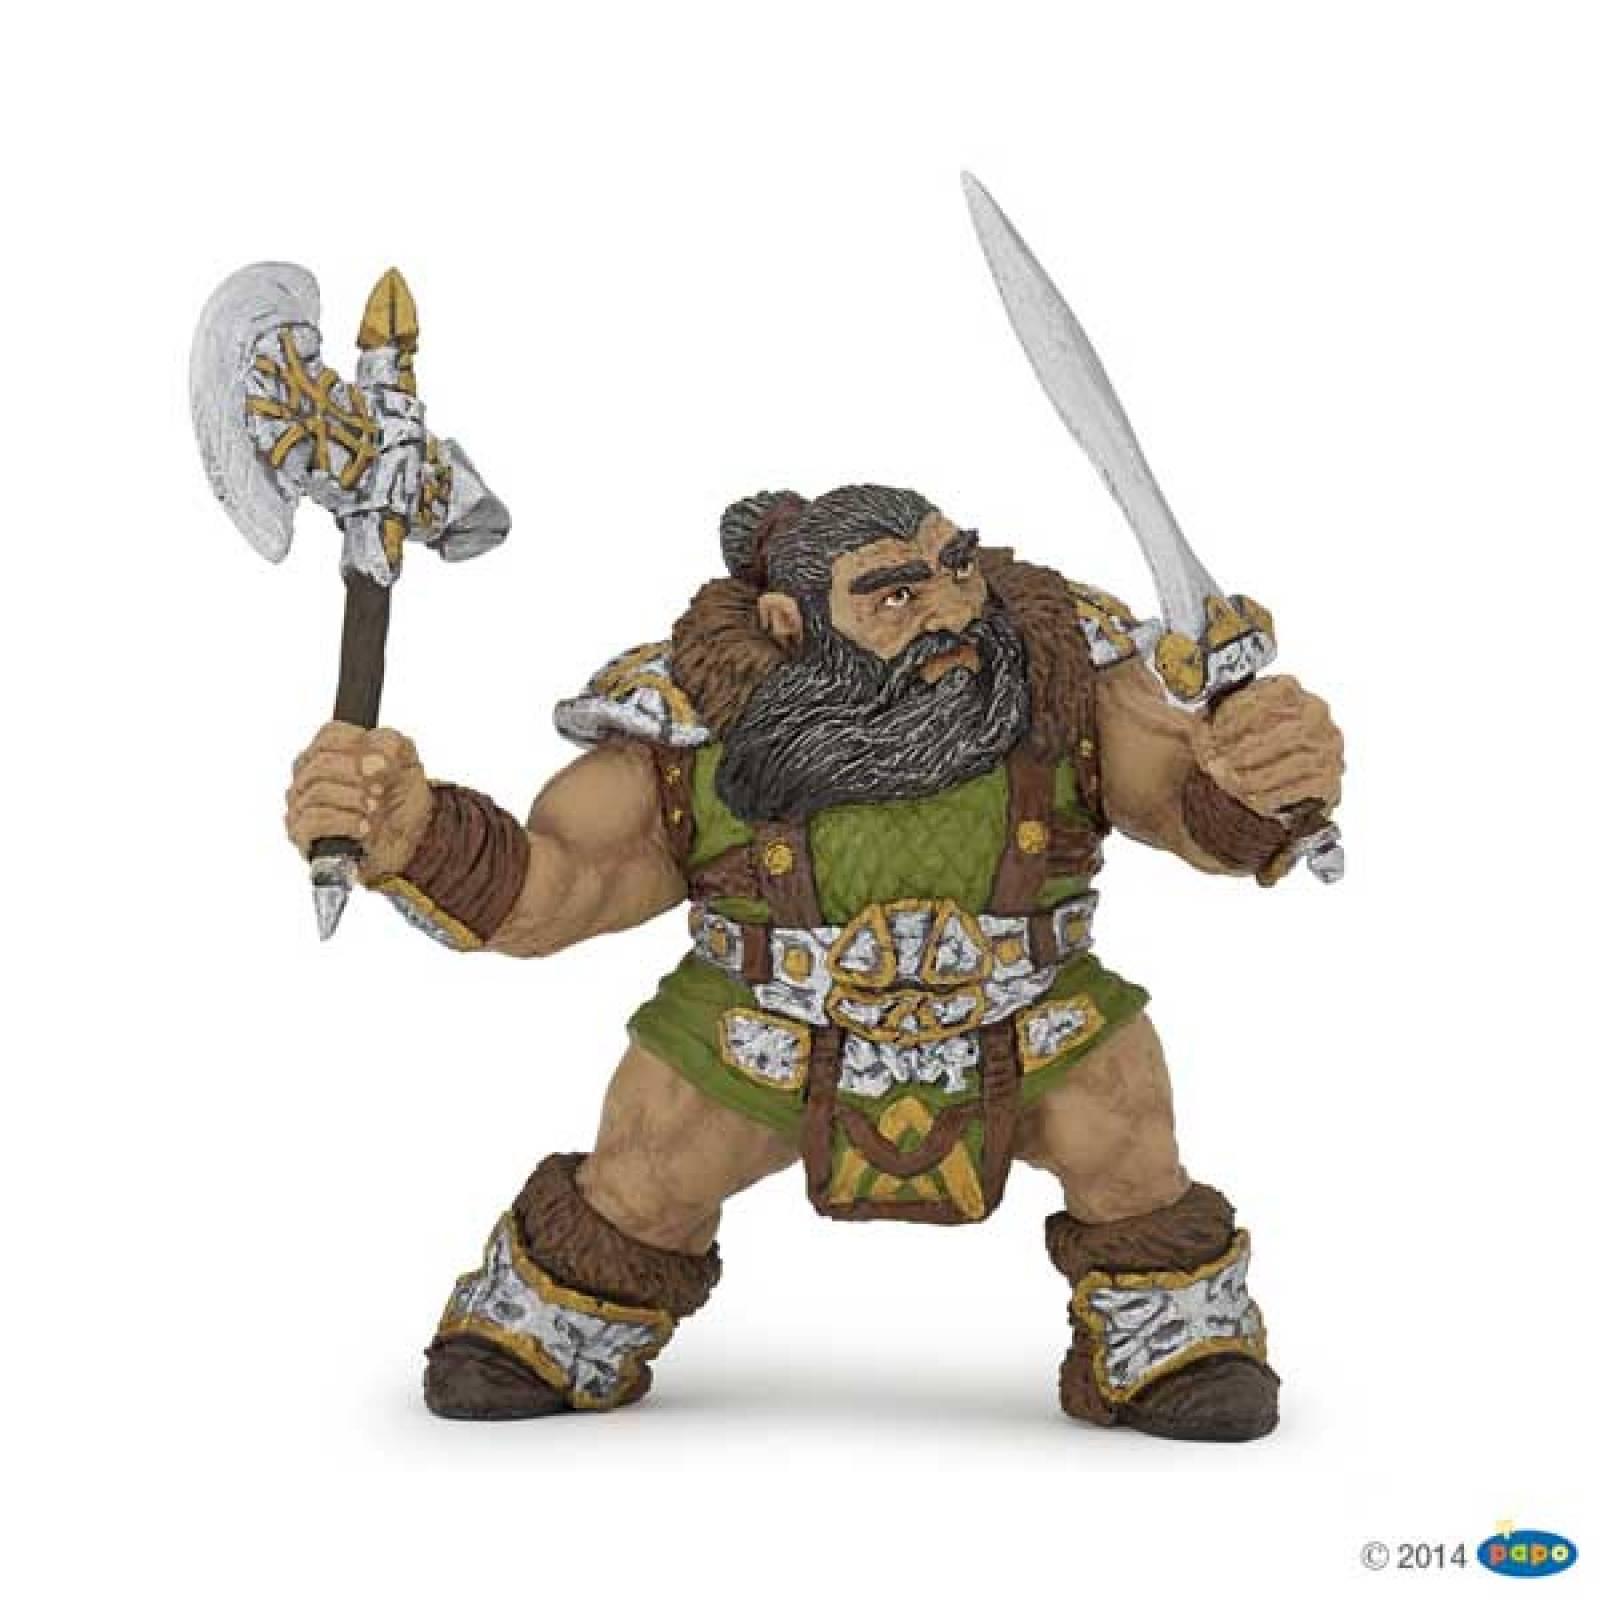 Dwarf Warrior With Axe Papo Fantasy Figure